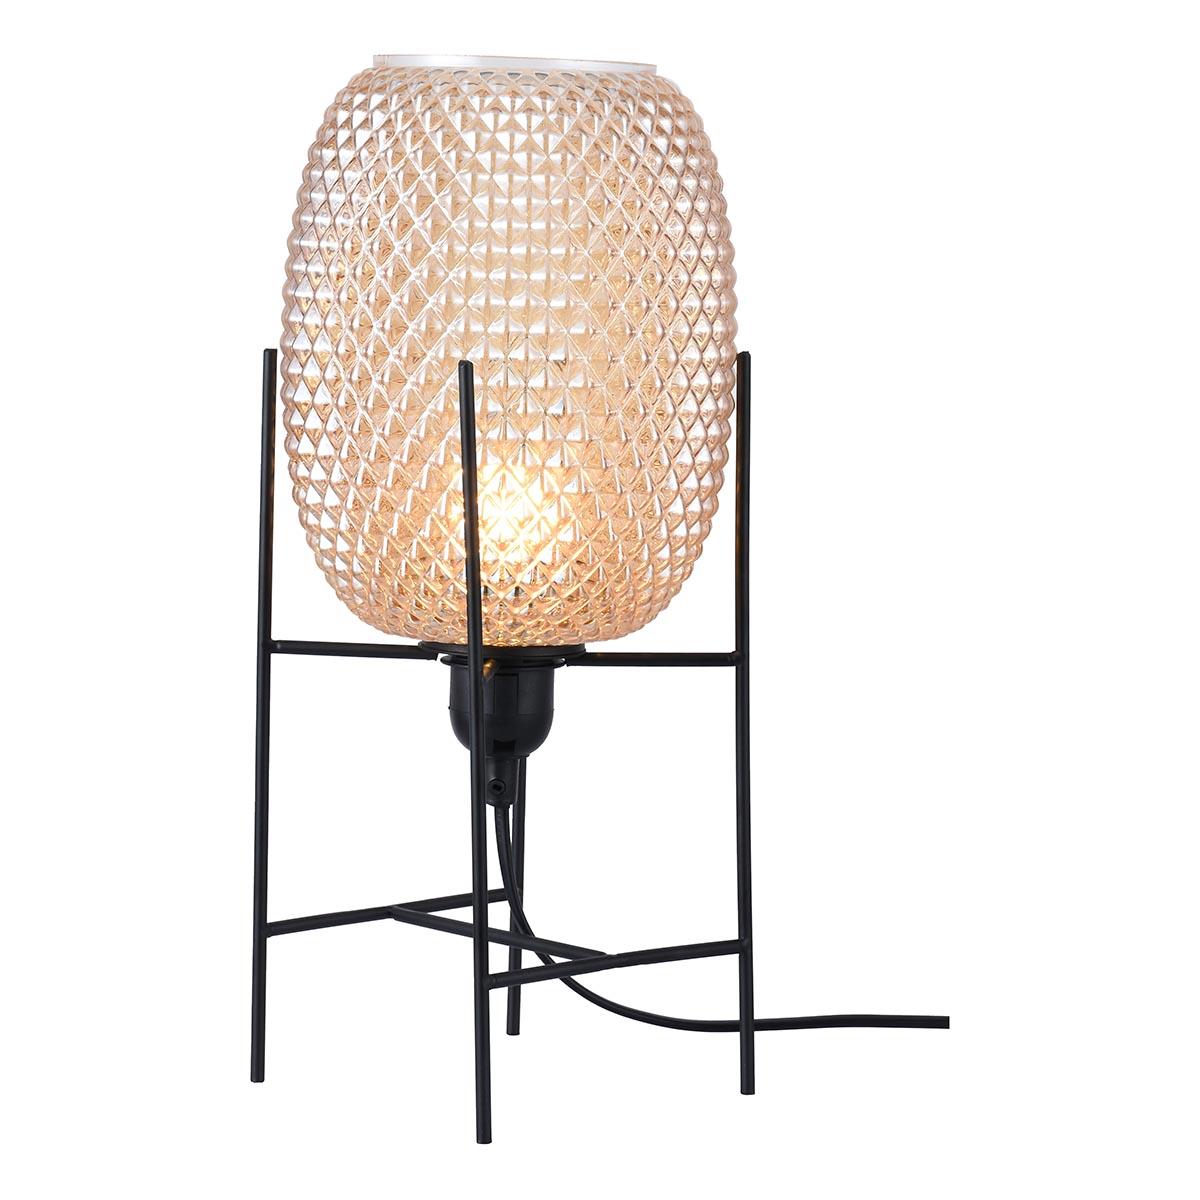 Настольная лампа Toplight TL1211T-01BL Alice бра toplight donna tl7510b 01bl